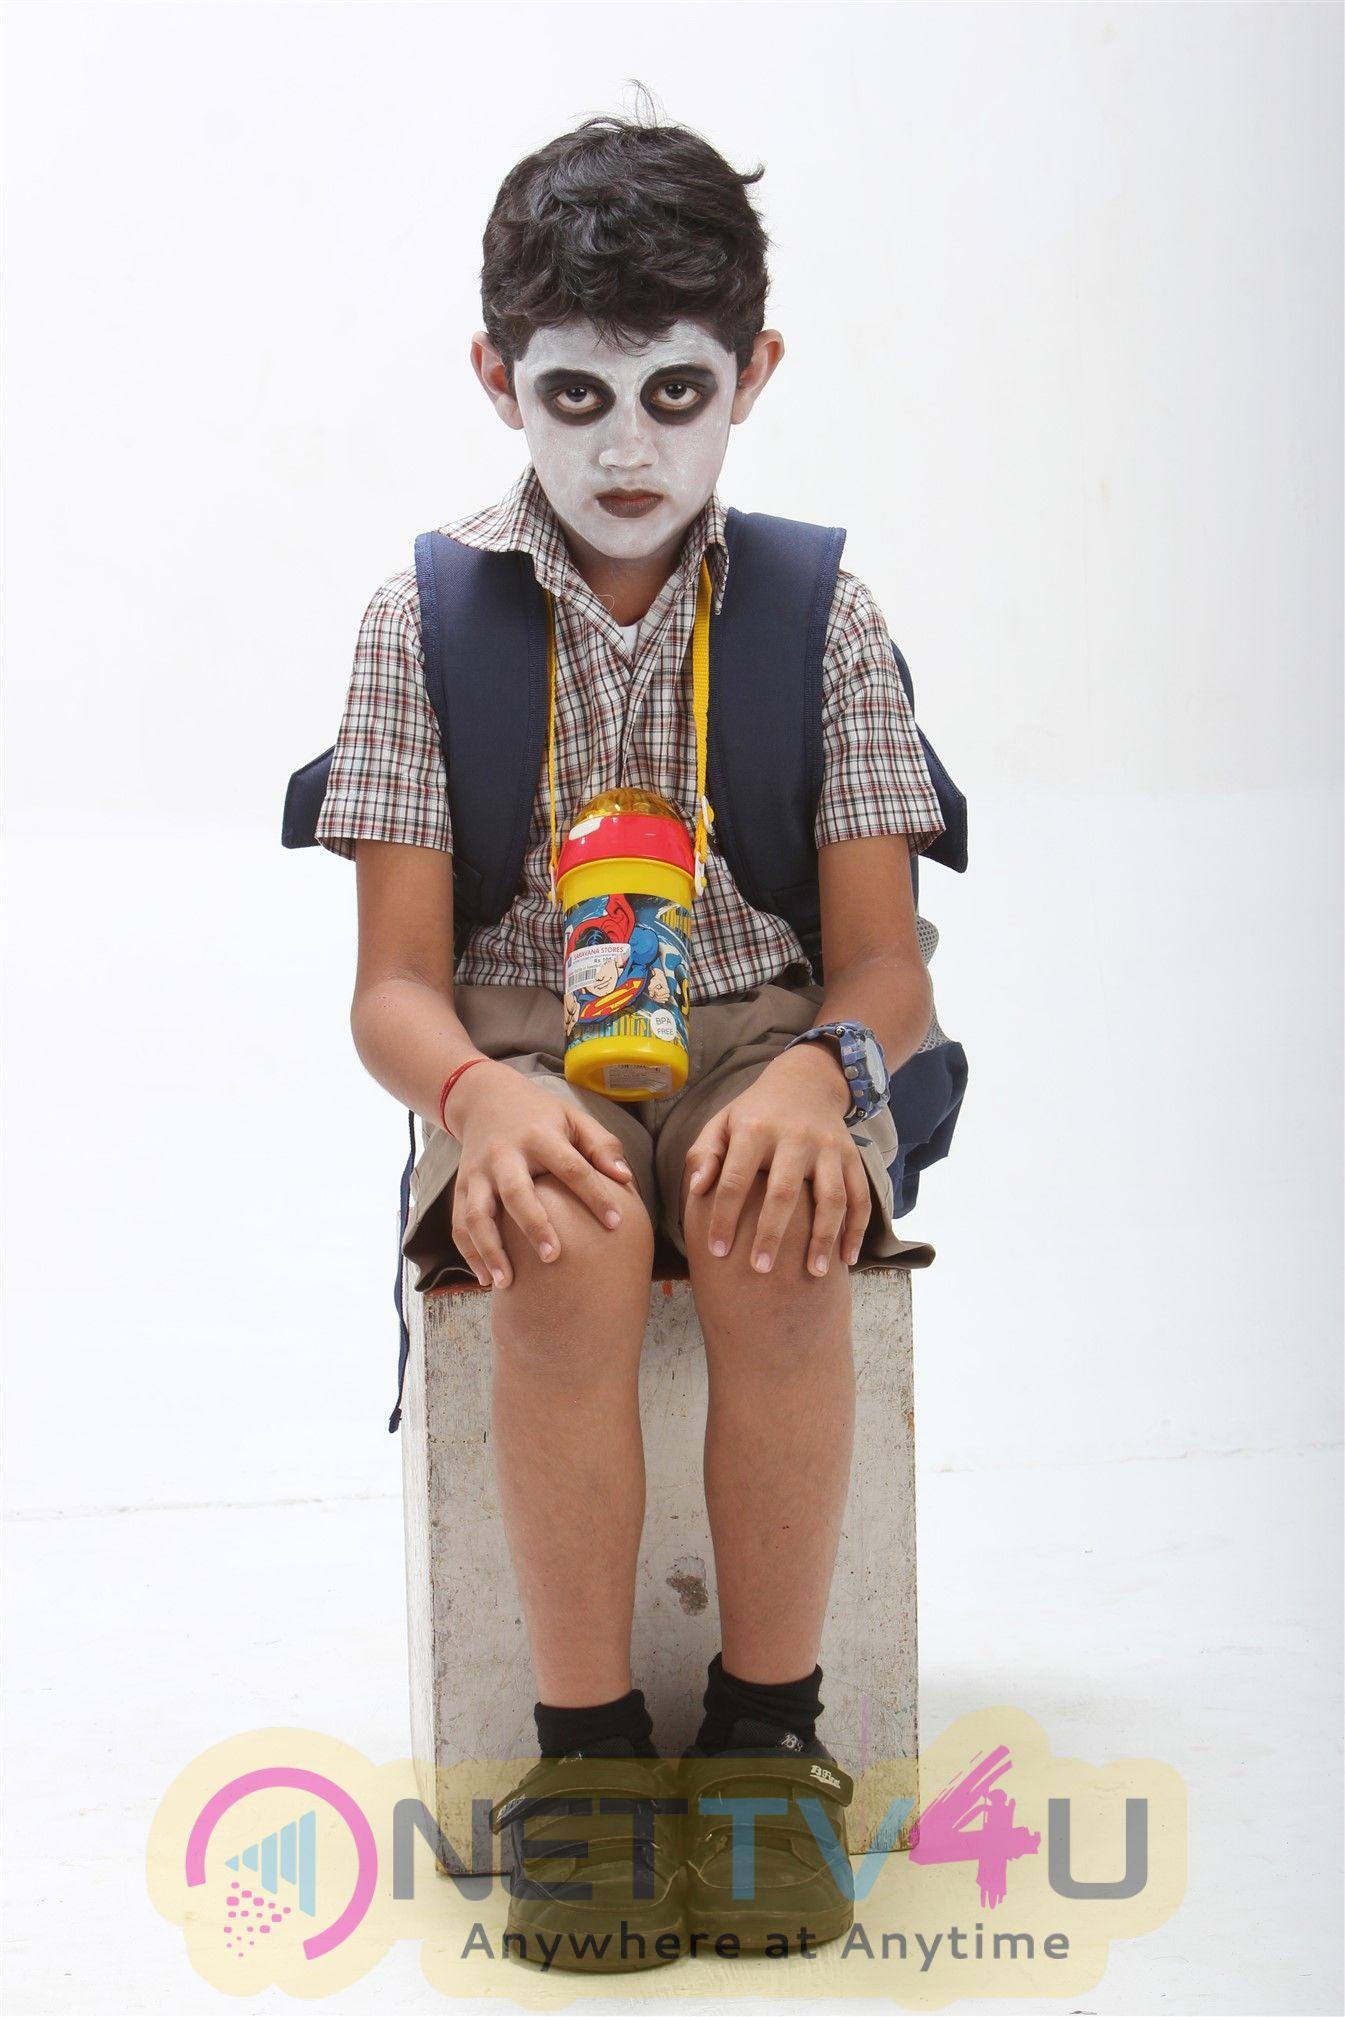 Padithavudan Kilithu Vidavum Movie Pics